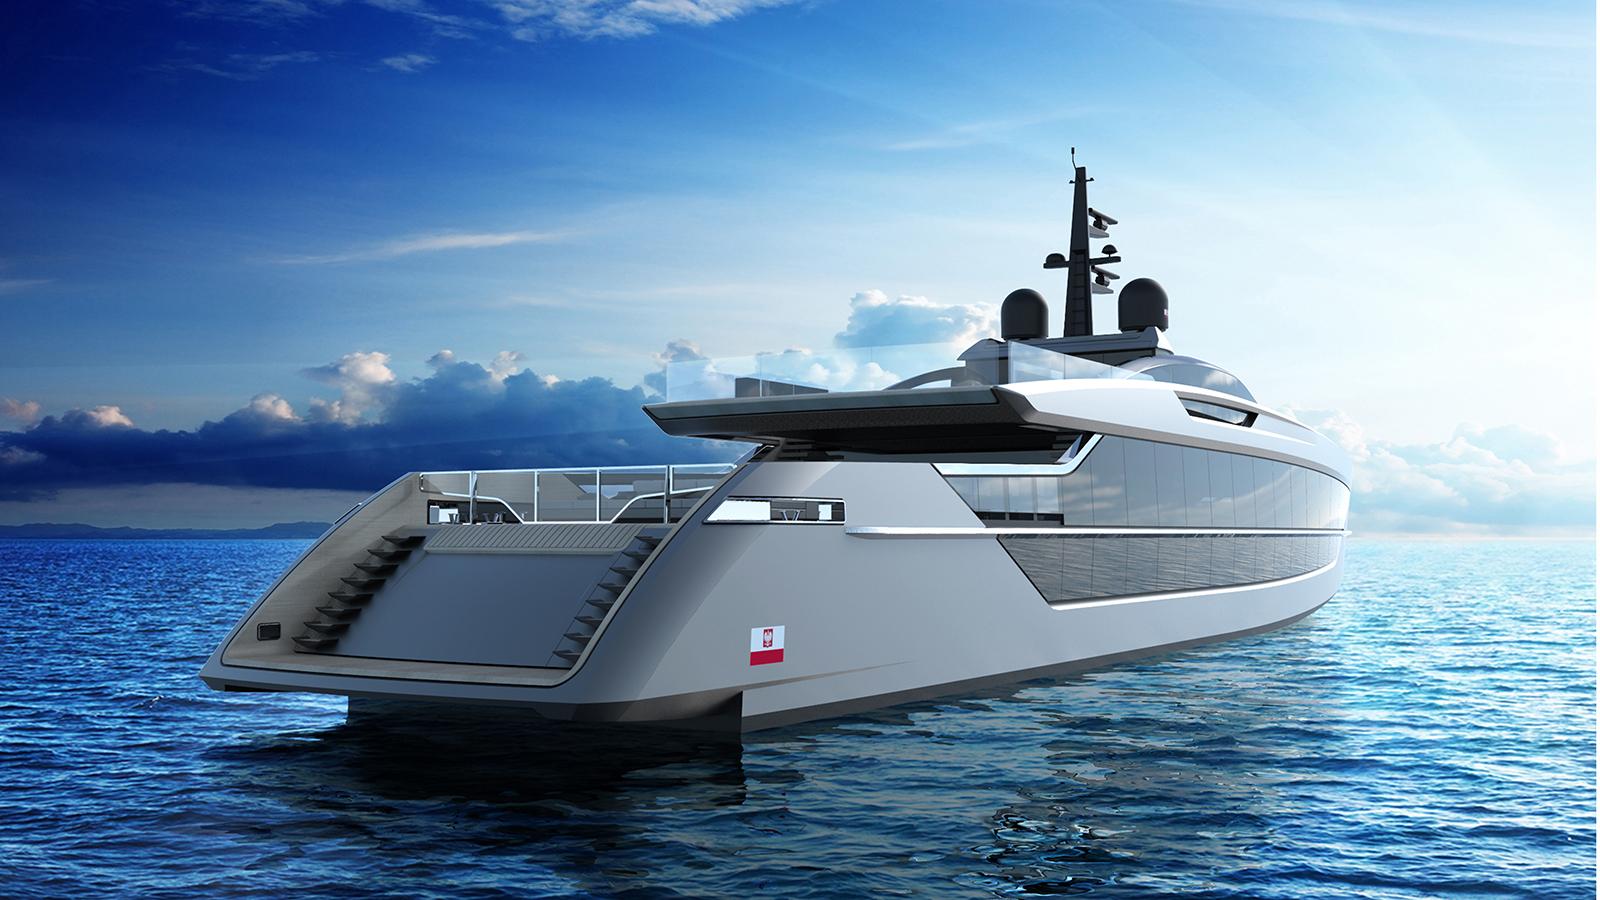 aft-view-of-the-53-metre-tankoa-motor-yacht-saetta